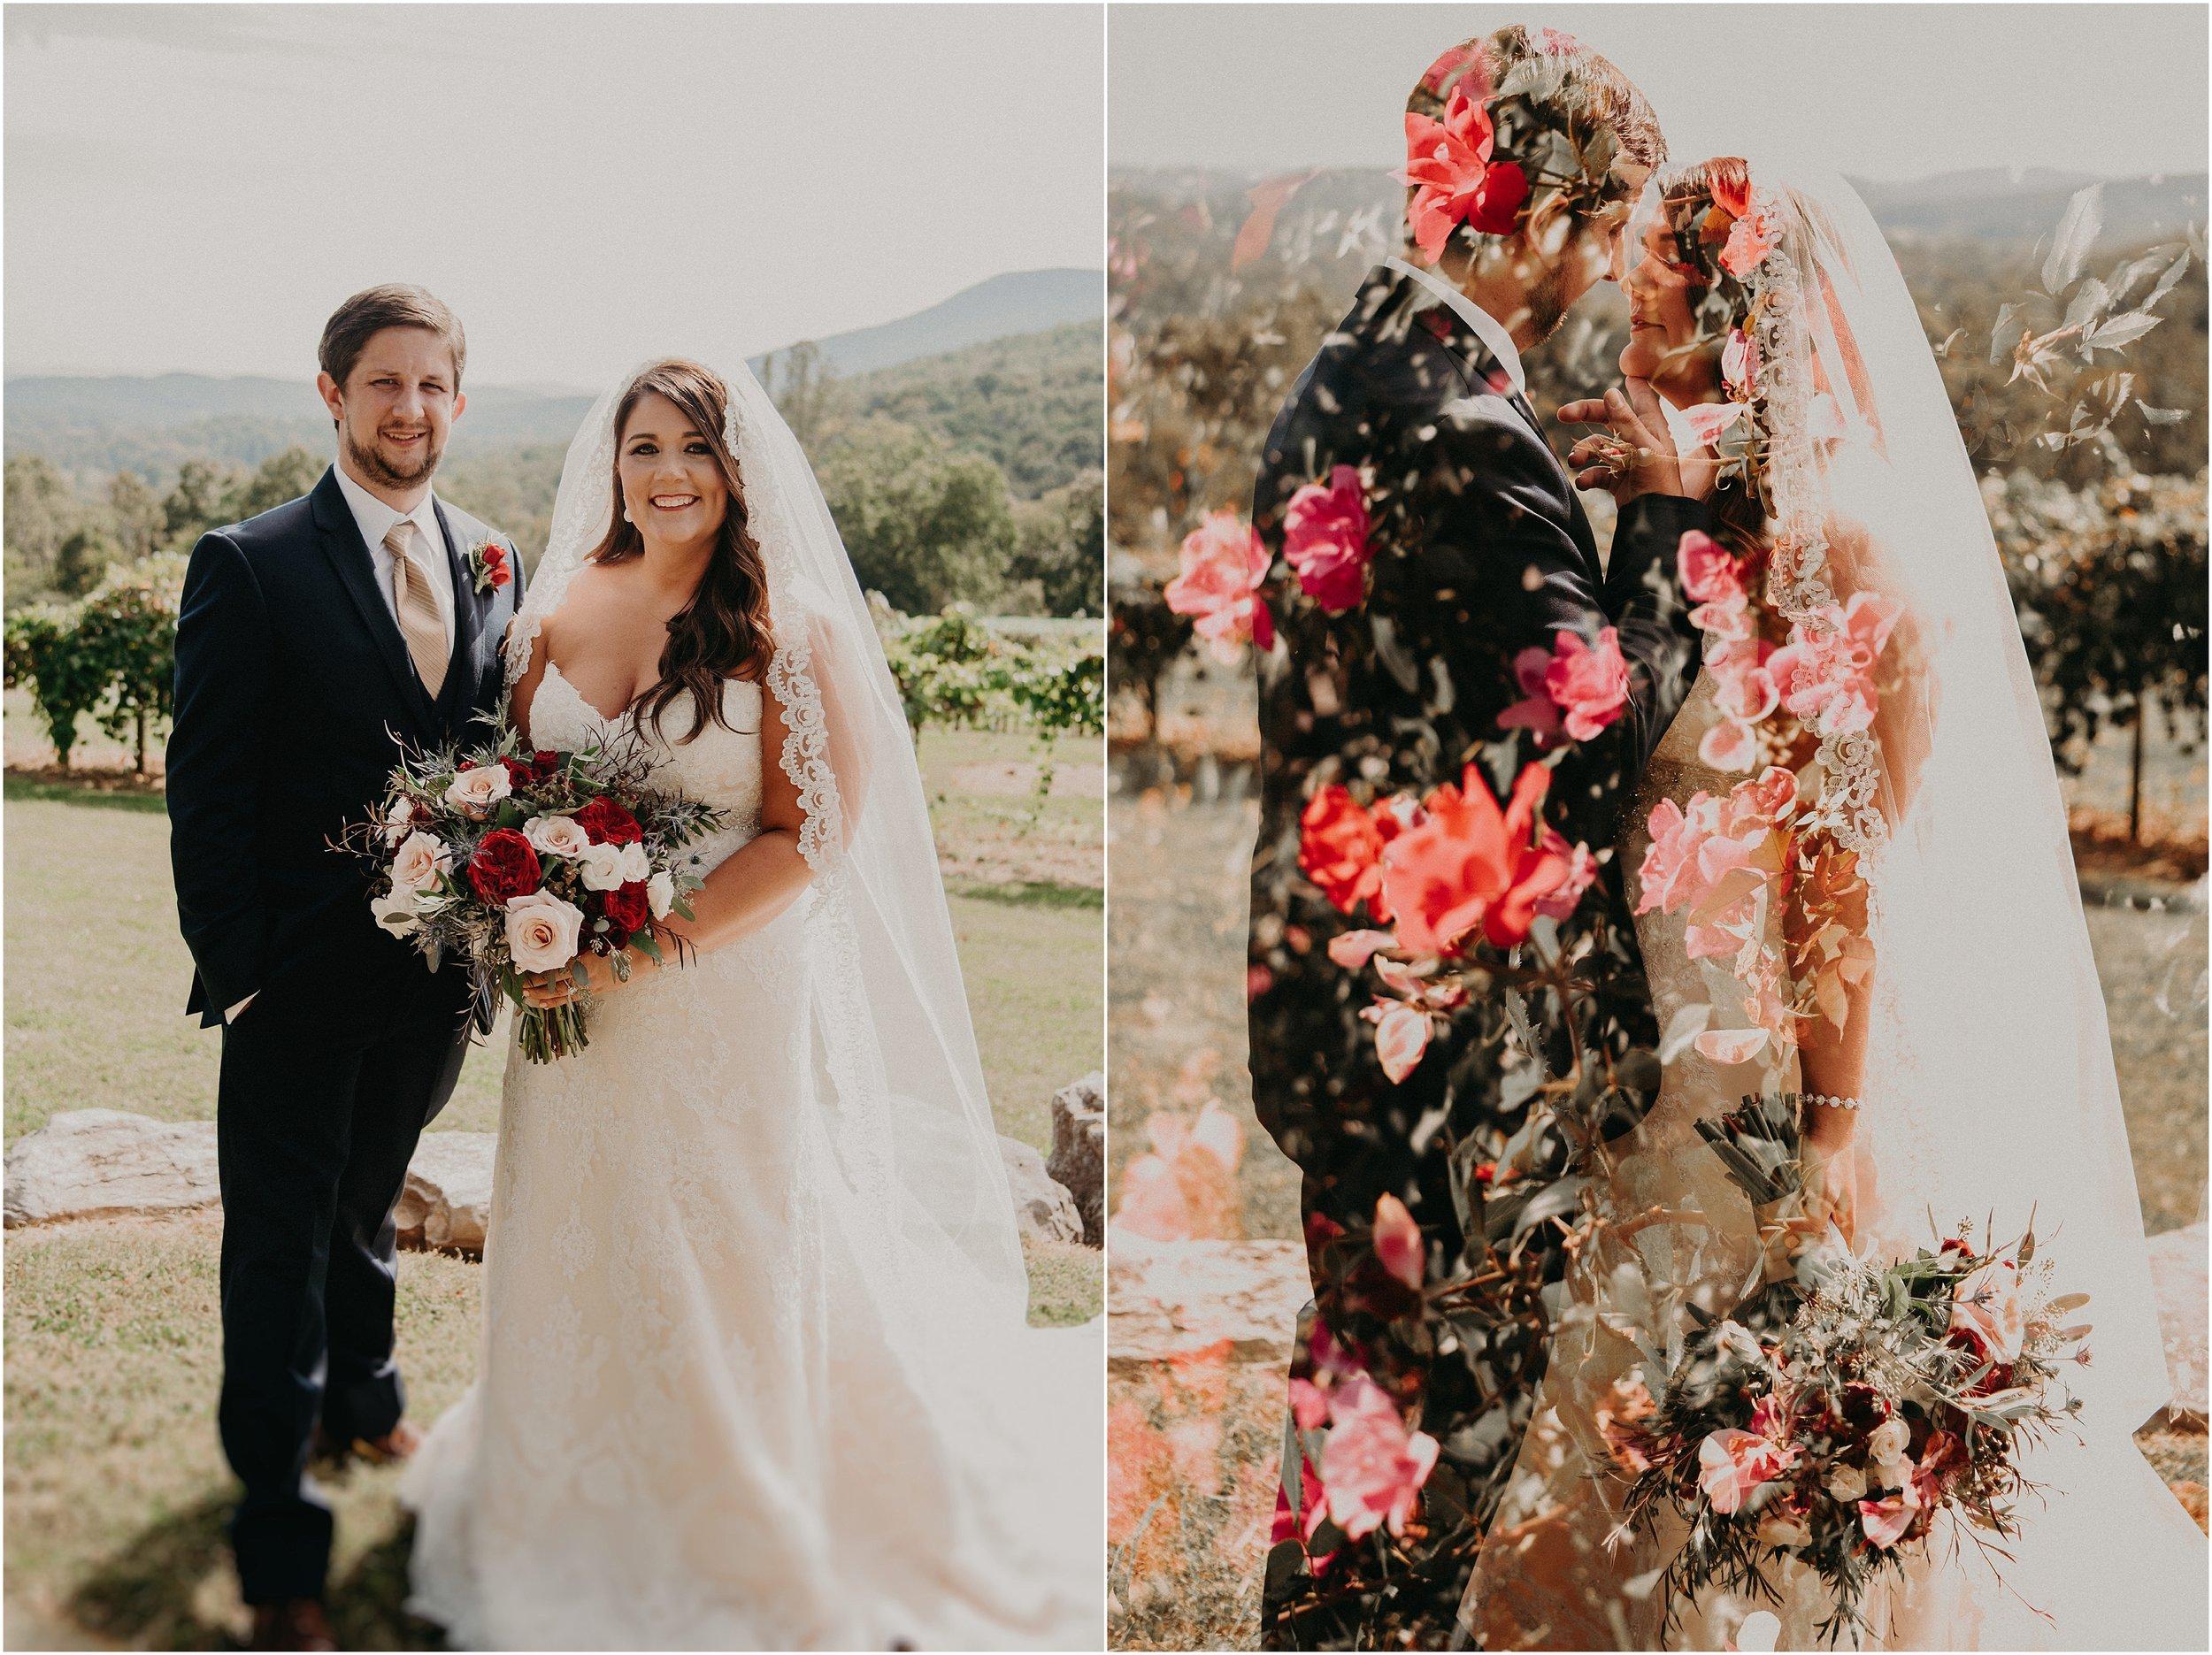 Double exposure wedding portrait with rose overlays